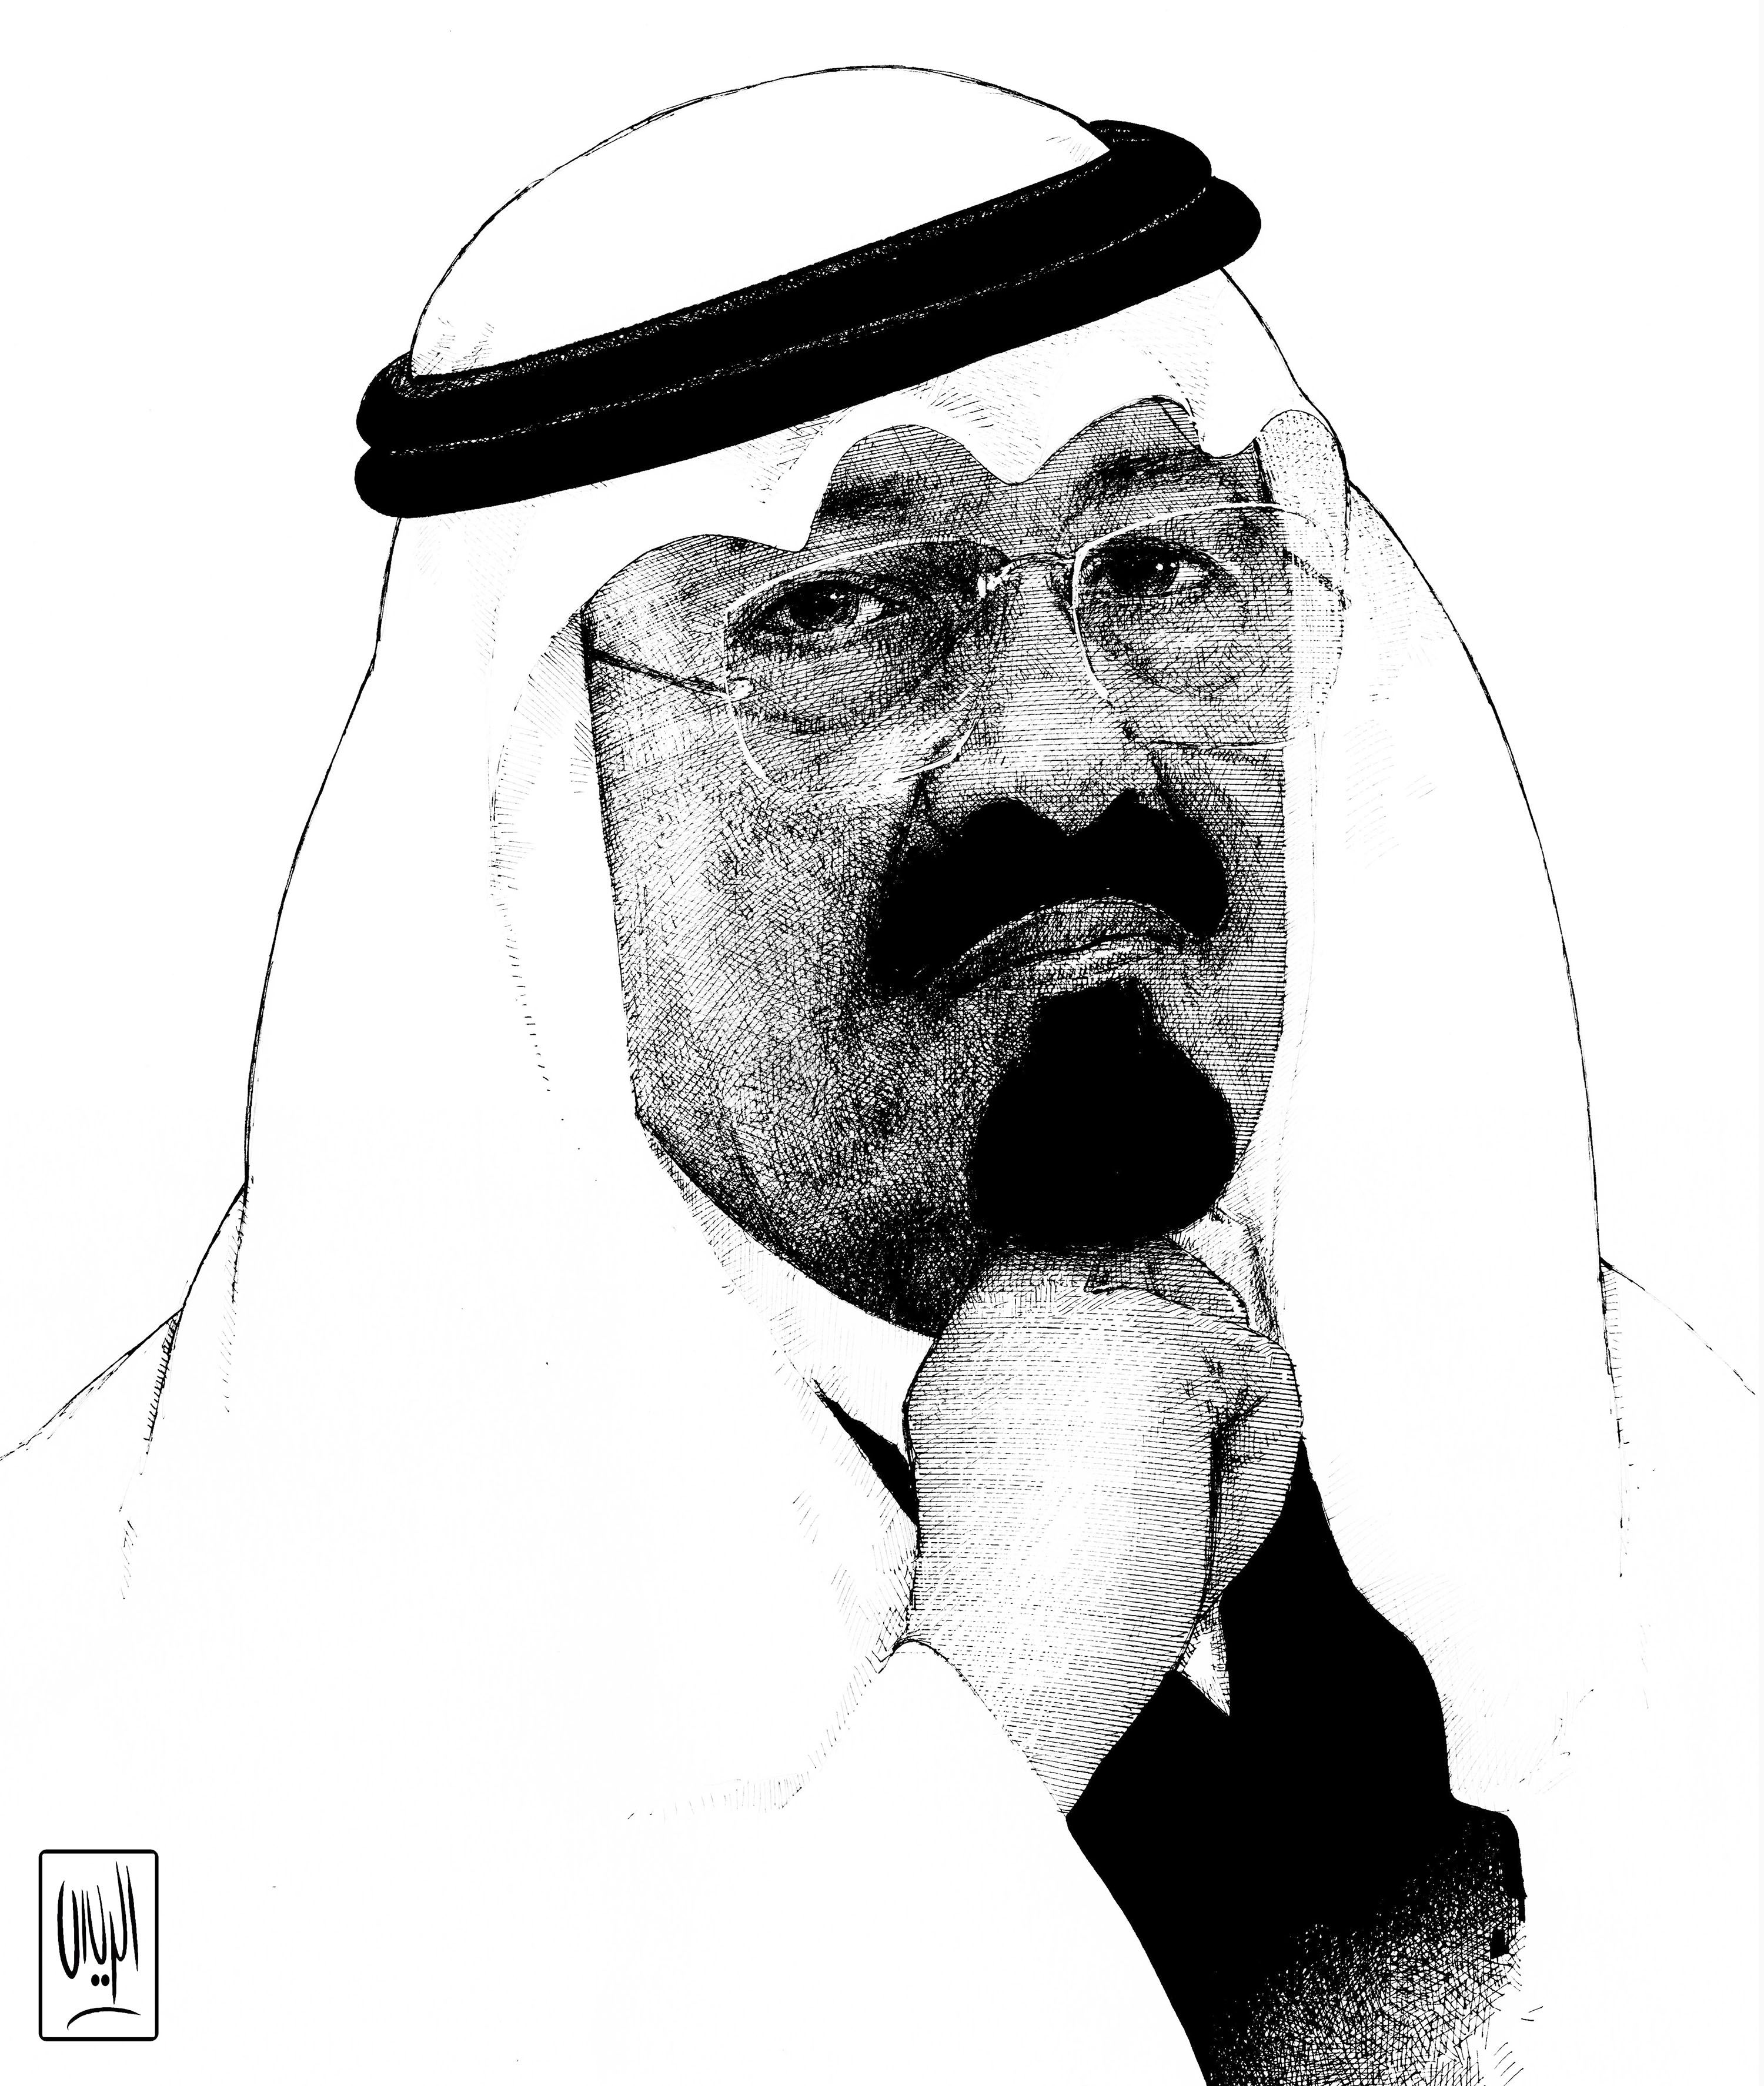 King Abdullah Ink الملك عبدالله Rayes Photo Art Art Photo Awards